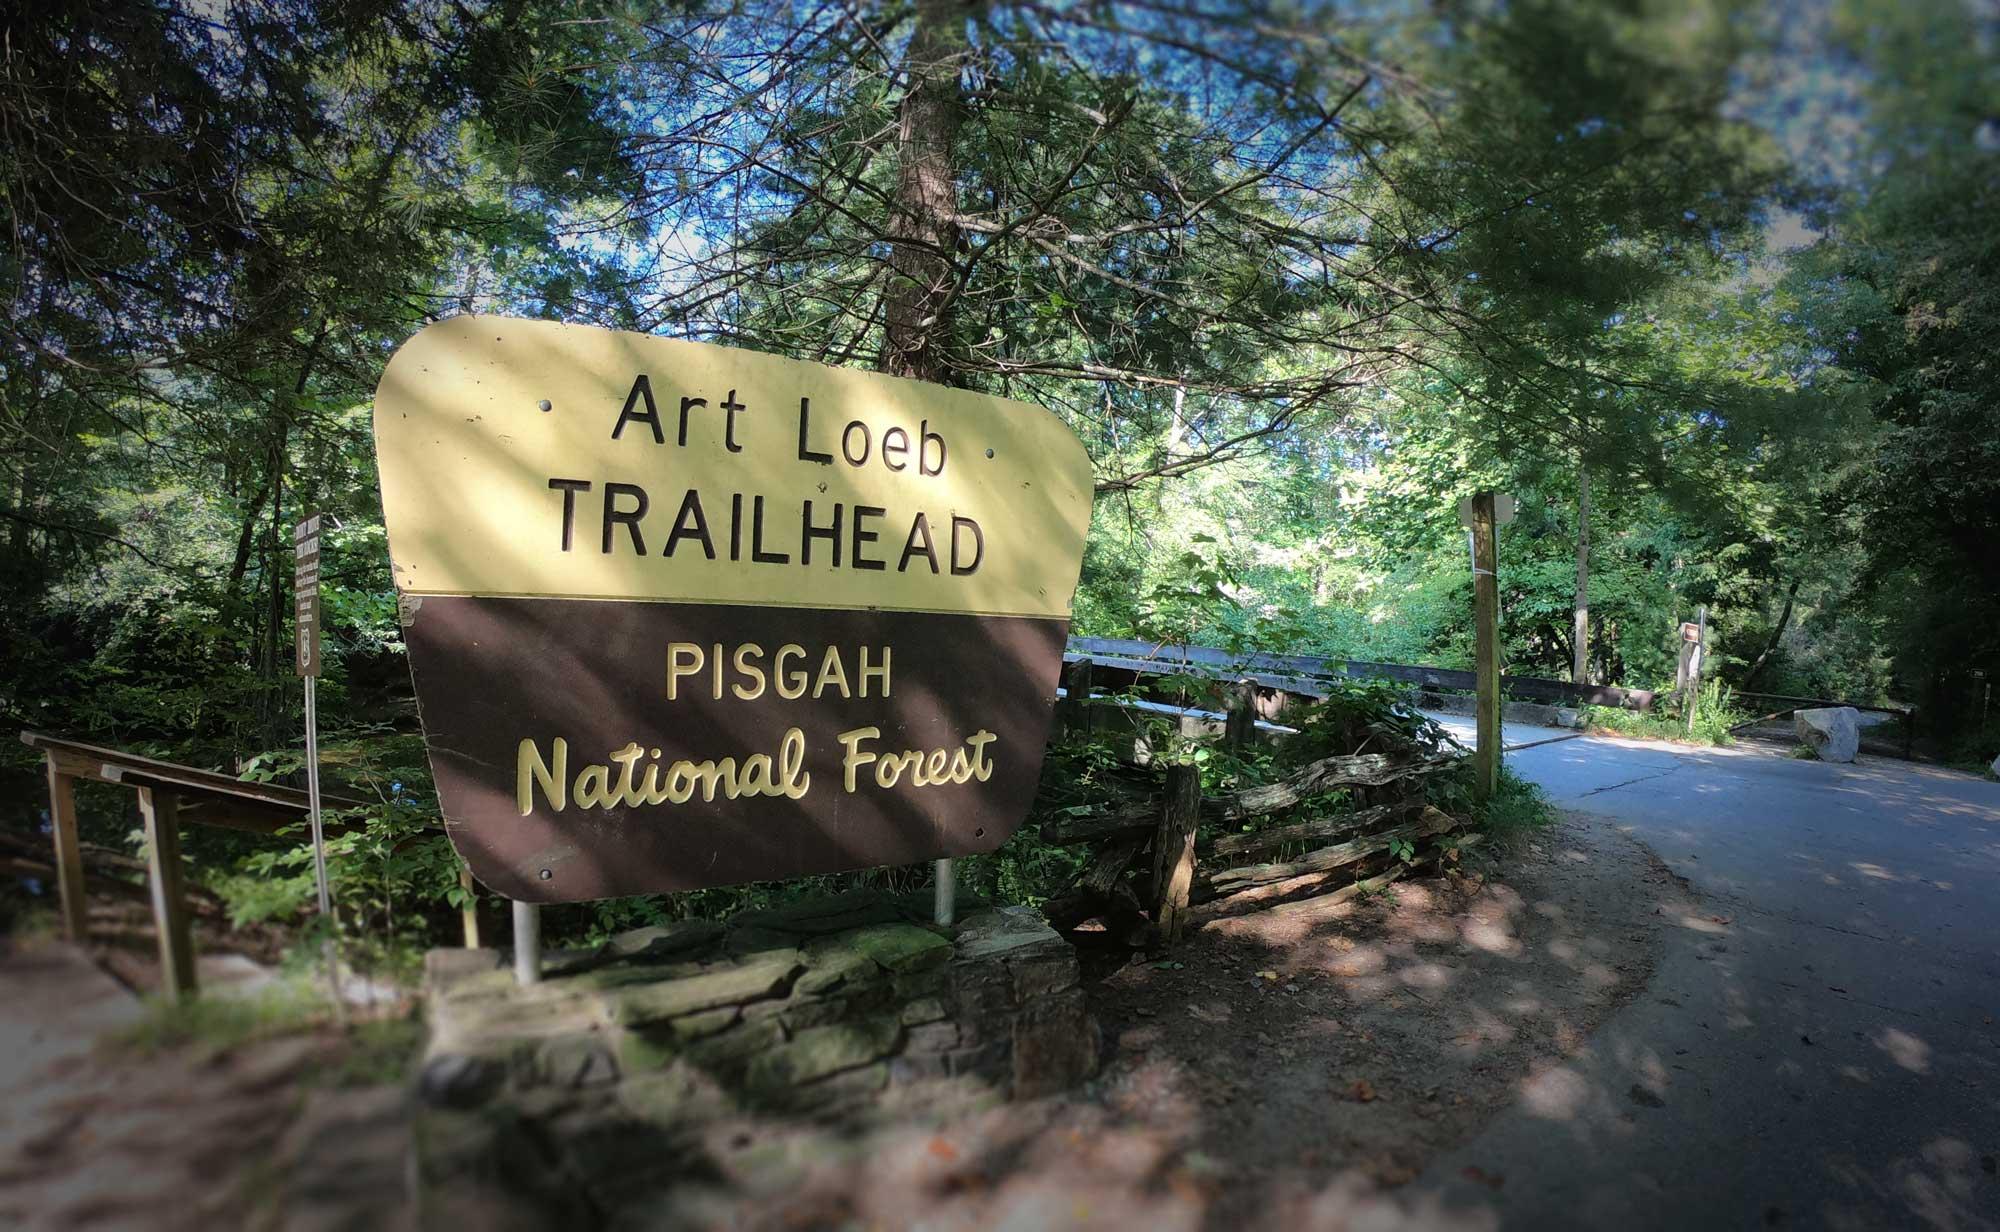 Art Loeb Trailhead signage in Pisgah National Forest, Davidson River Campground, North Carolina